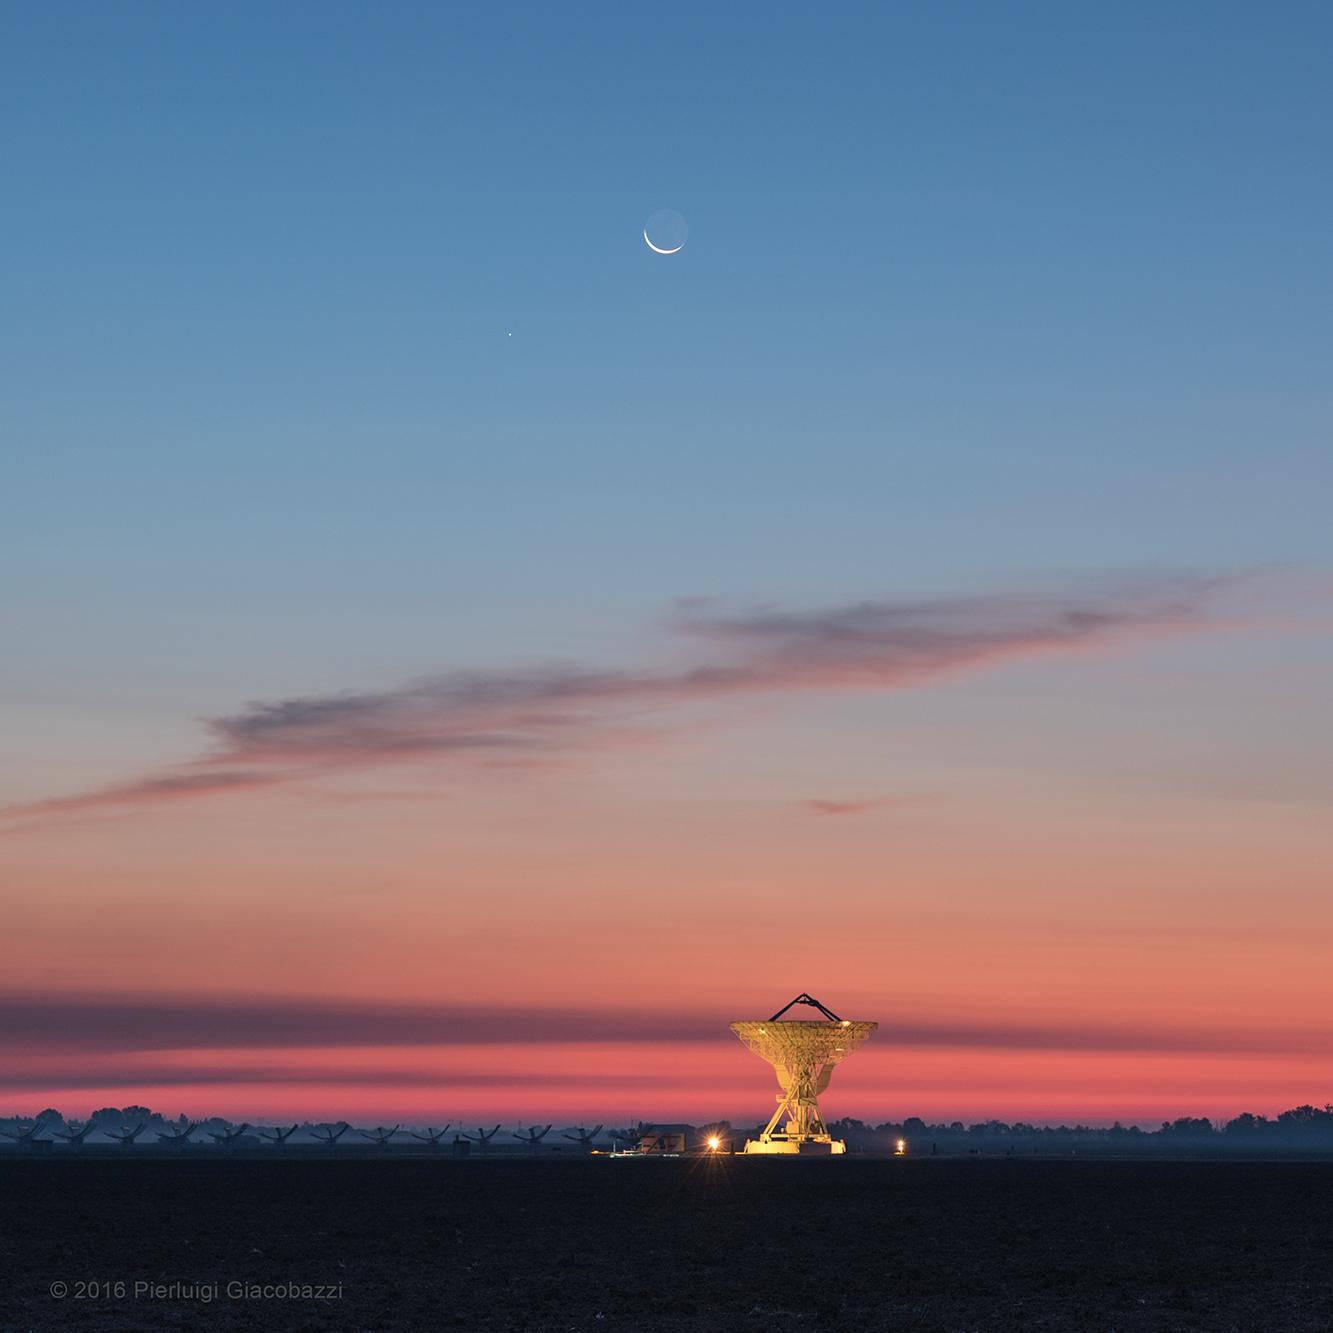 [ASTRONOMIA]   Moon, Mercury, and Twilight Radio